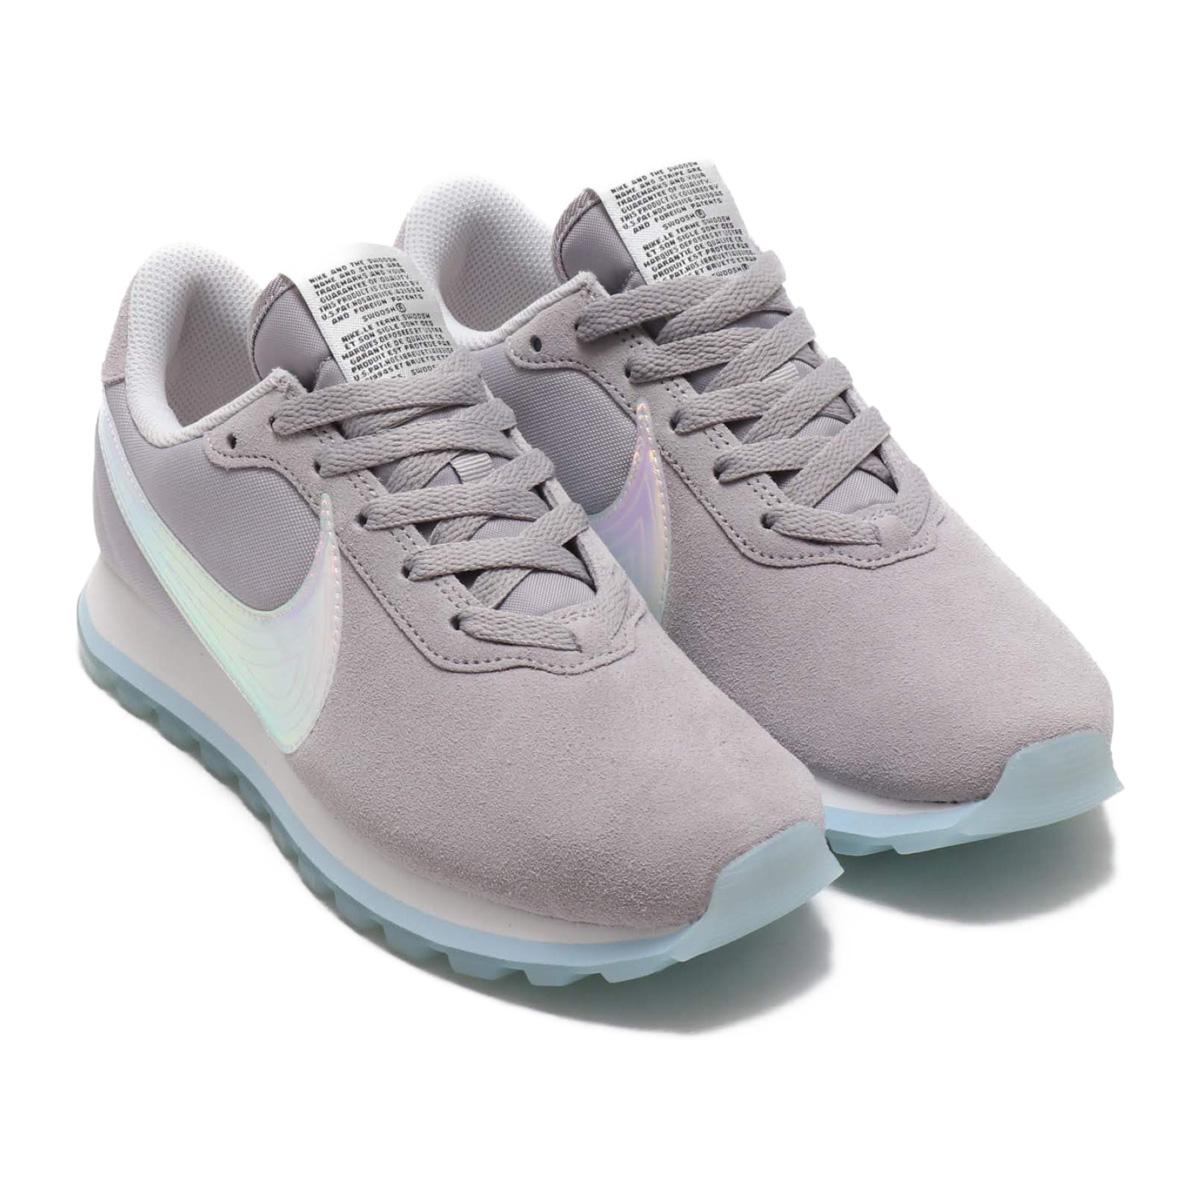 bb4ecd5c5c2 atmos pink: NIKE W PRE-LOVE O.X. (Nike women pre-love OX) ATMOSPHERE ...